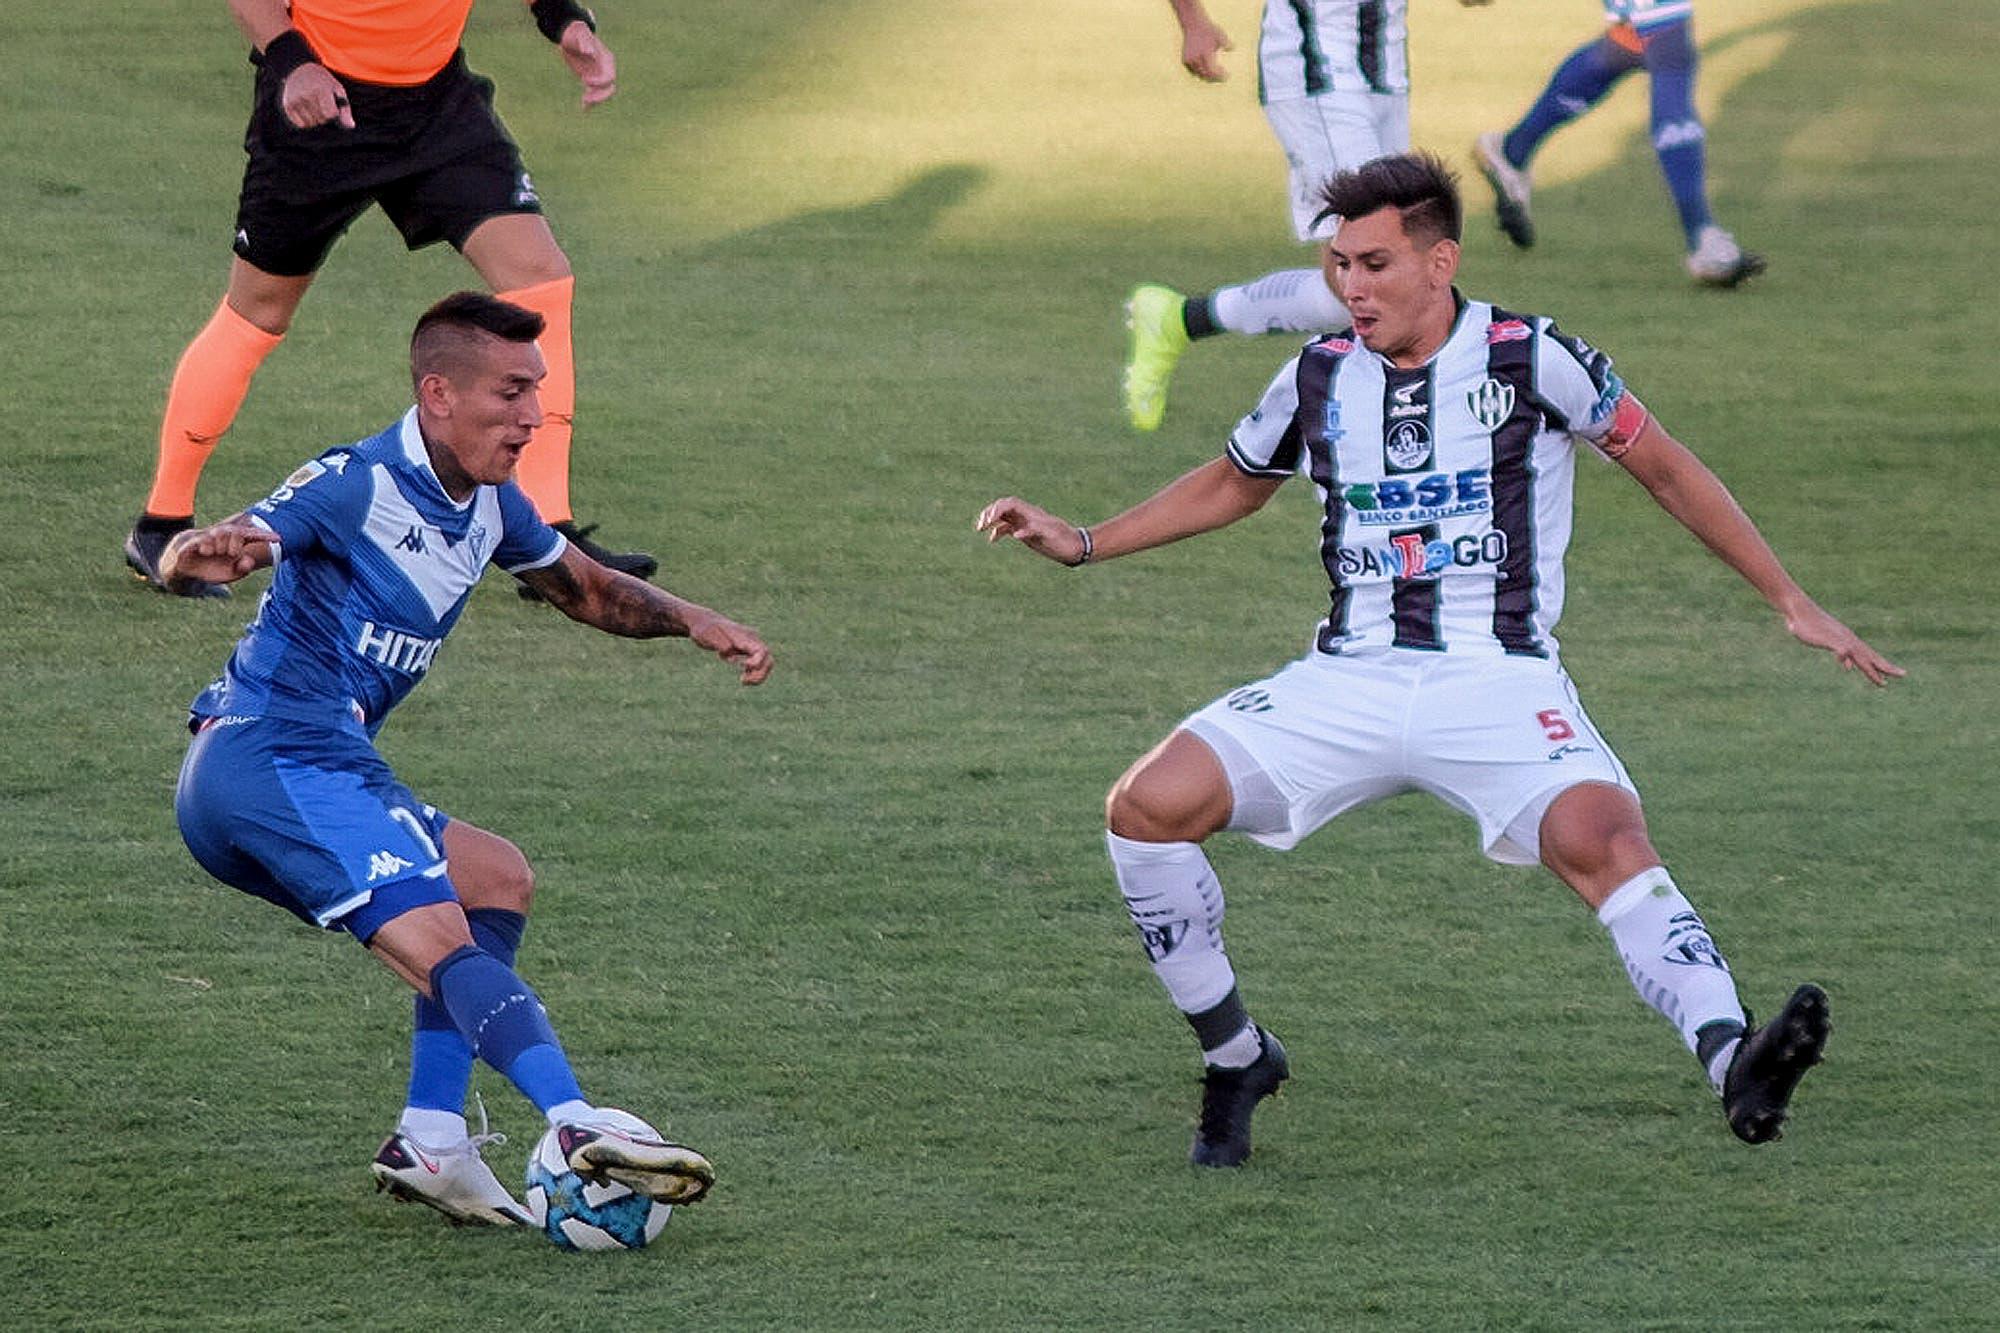 Central Córdoba-Vélez, por la Copa Diego Maradona: el golazo de tiro libre de Ricky Álvarez en Santiago del Estero